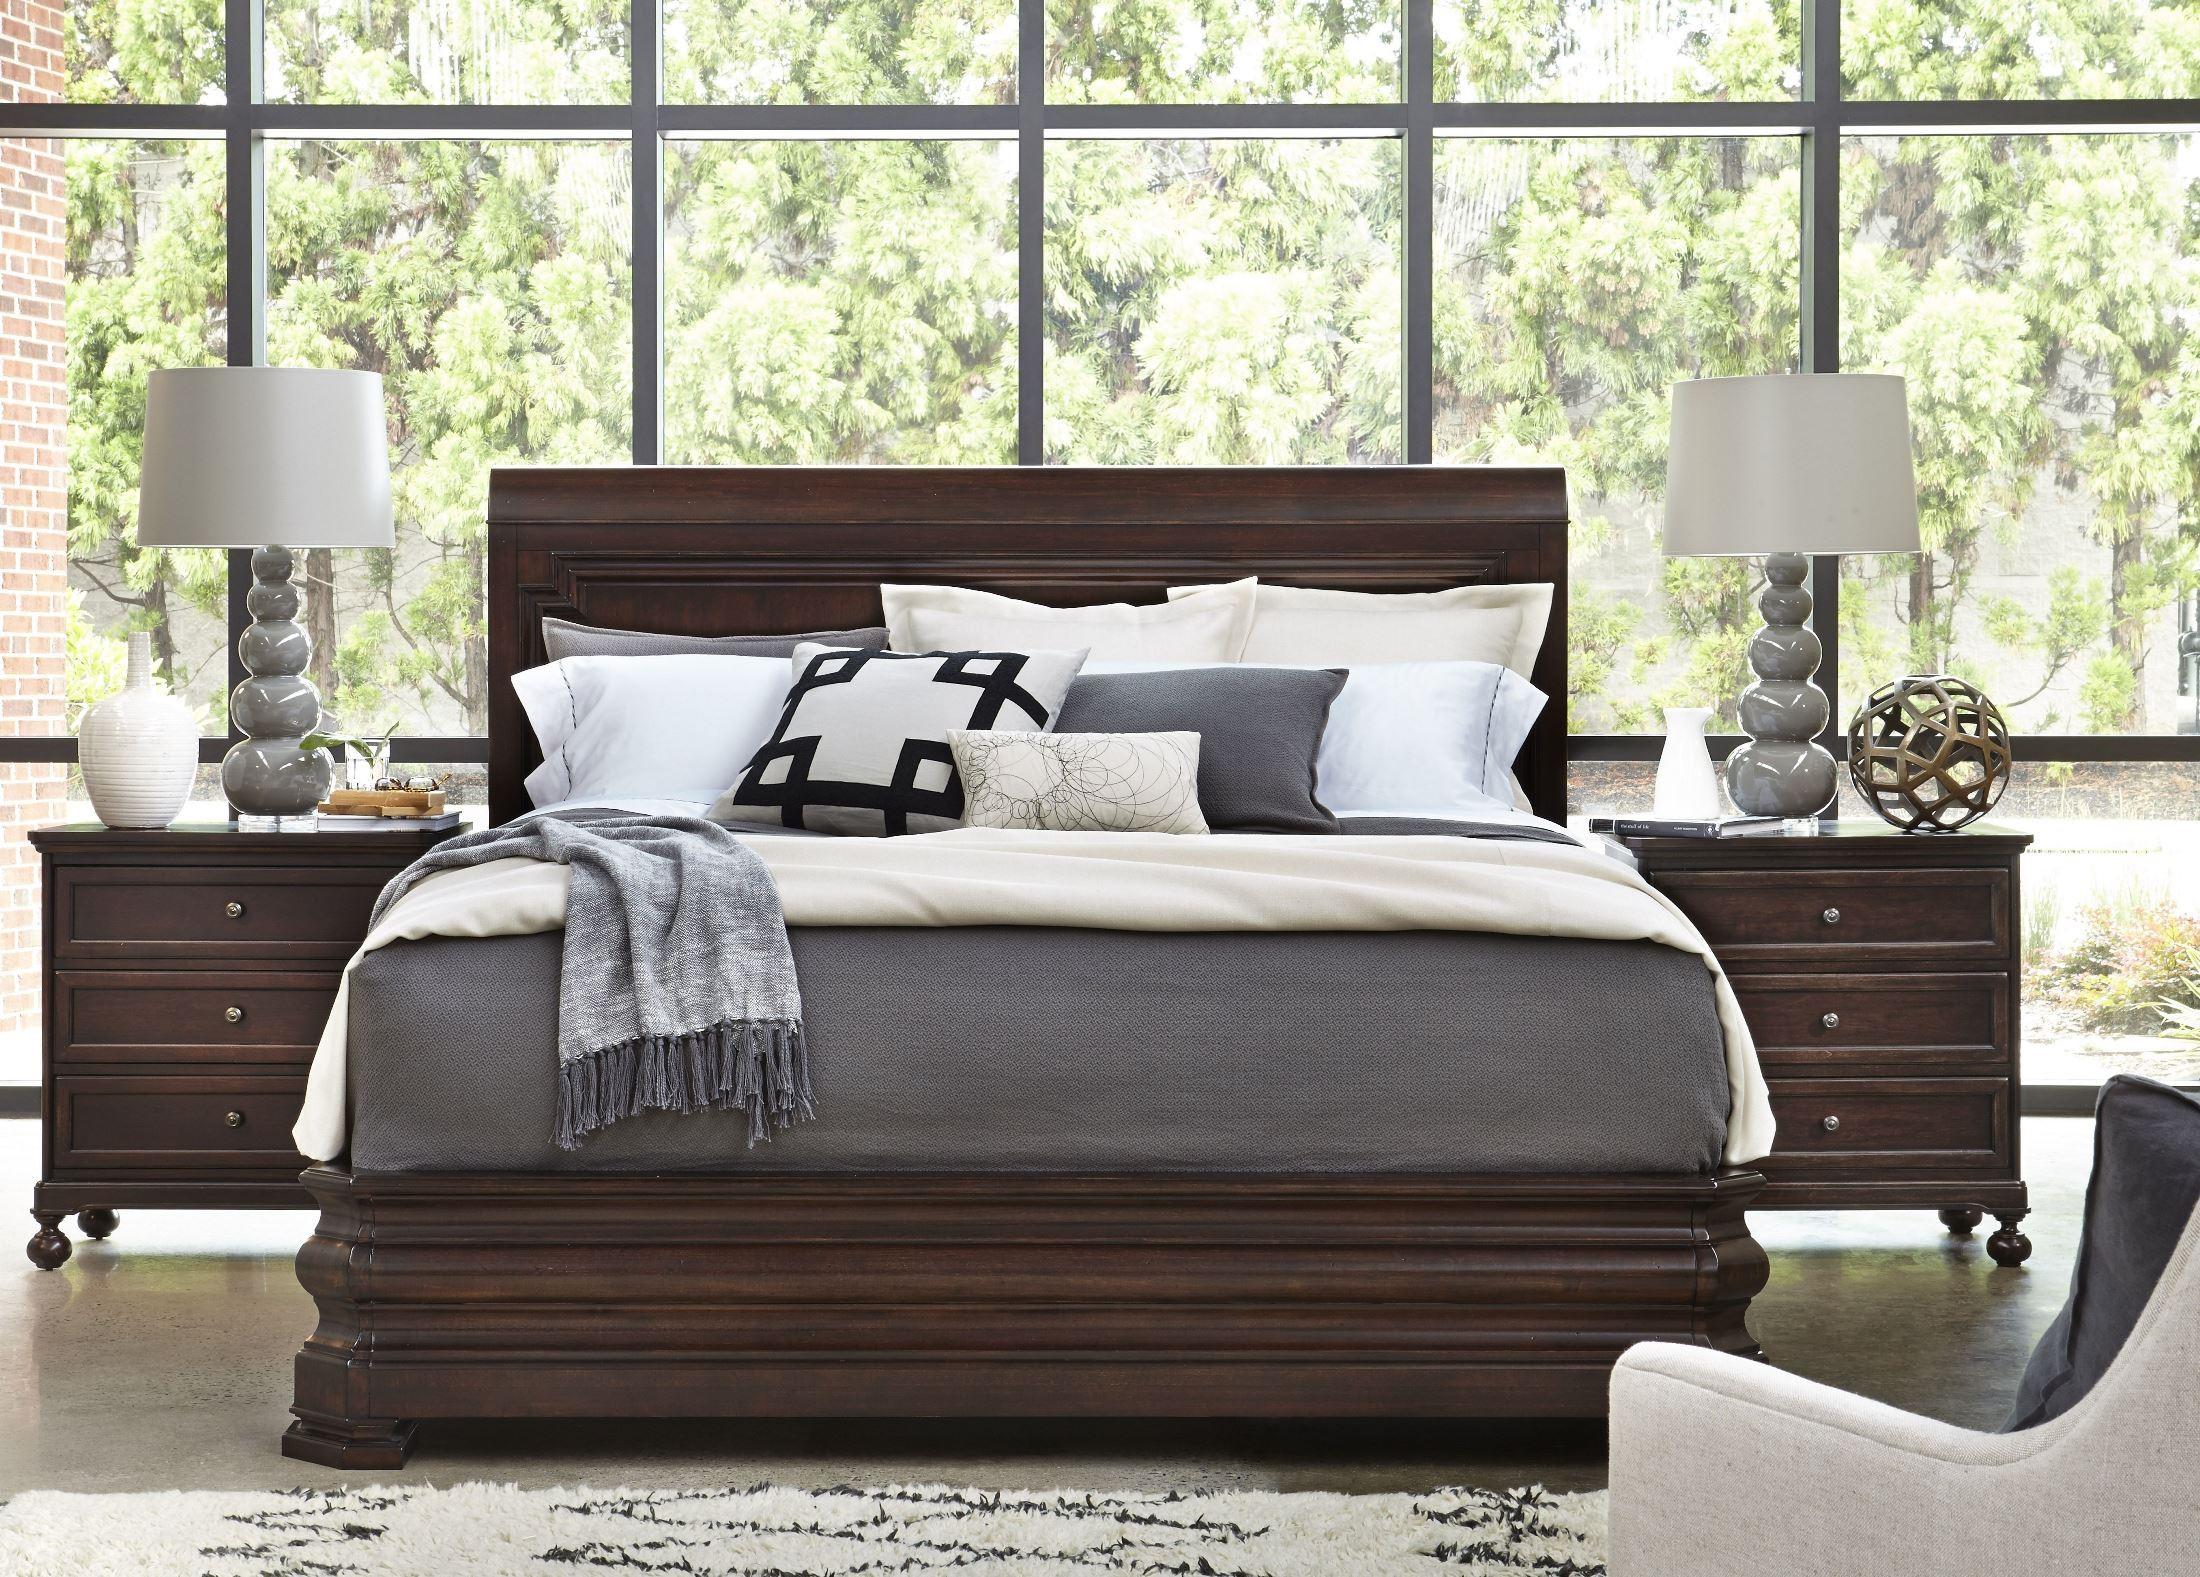 Proximity sumatra sleigh bedroom set 35675b universal for Sleigh bedroom set